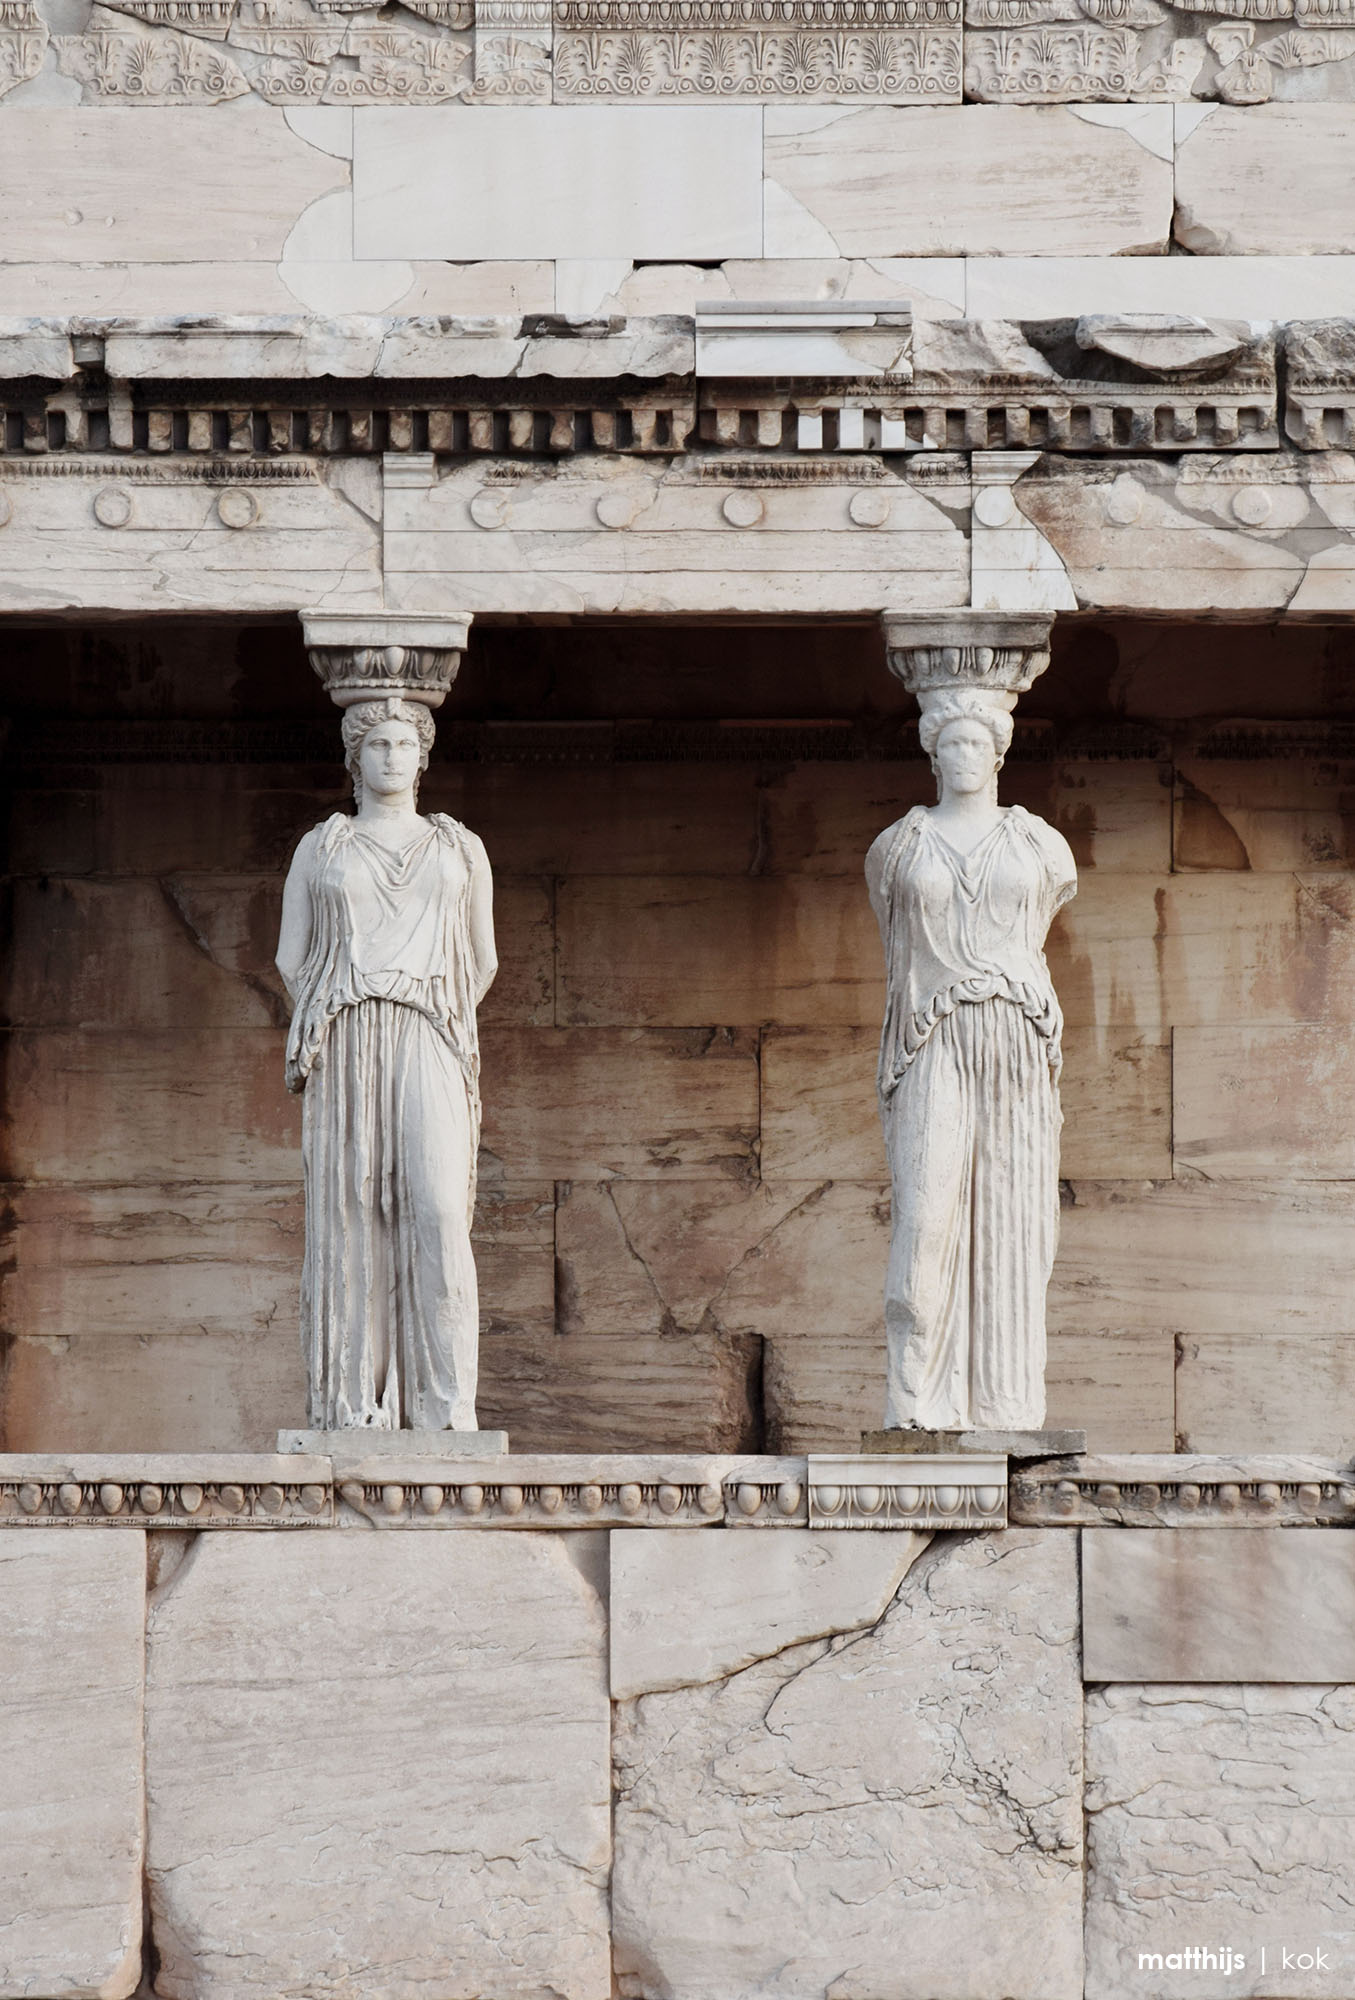 Caryatid porch of the Erechtheion, Athens, Greece | Photo by Matthijs Kok